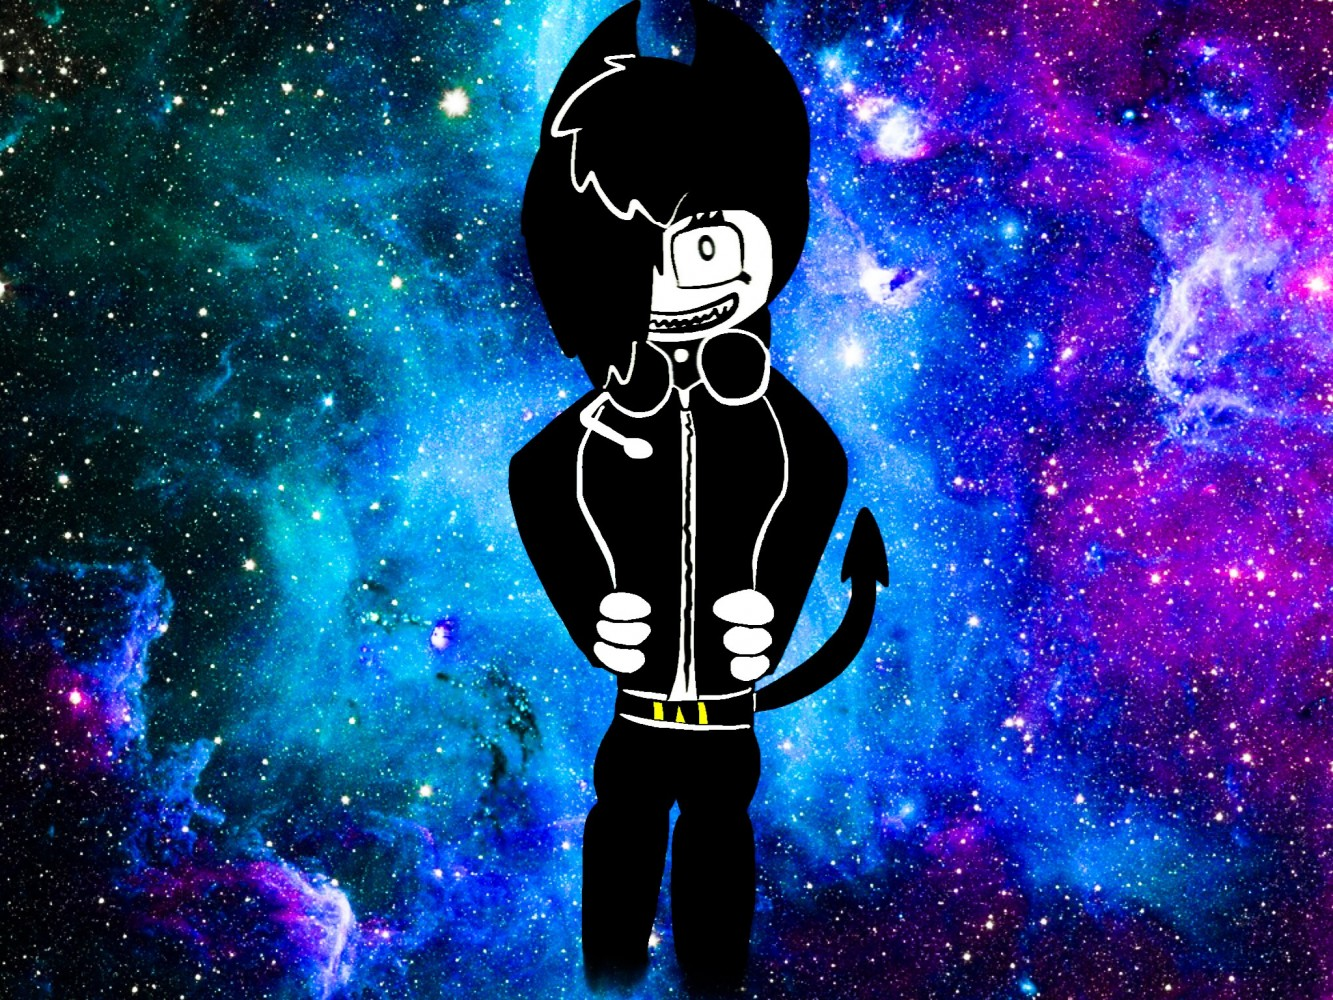 main-image-Lisa (version 2) uploaded by Sammygamer